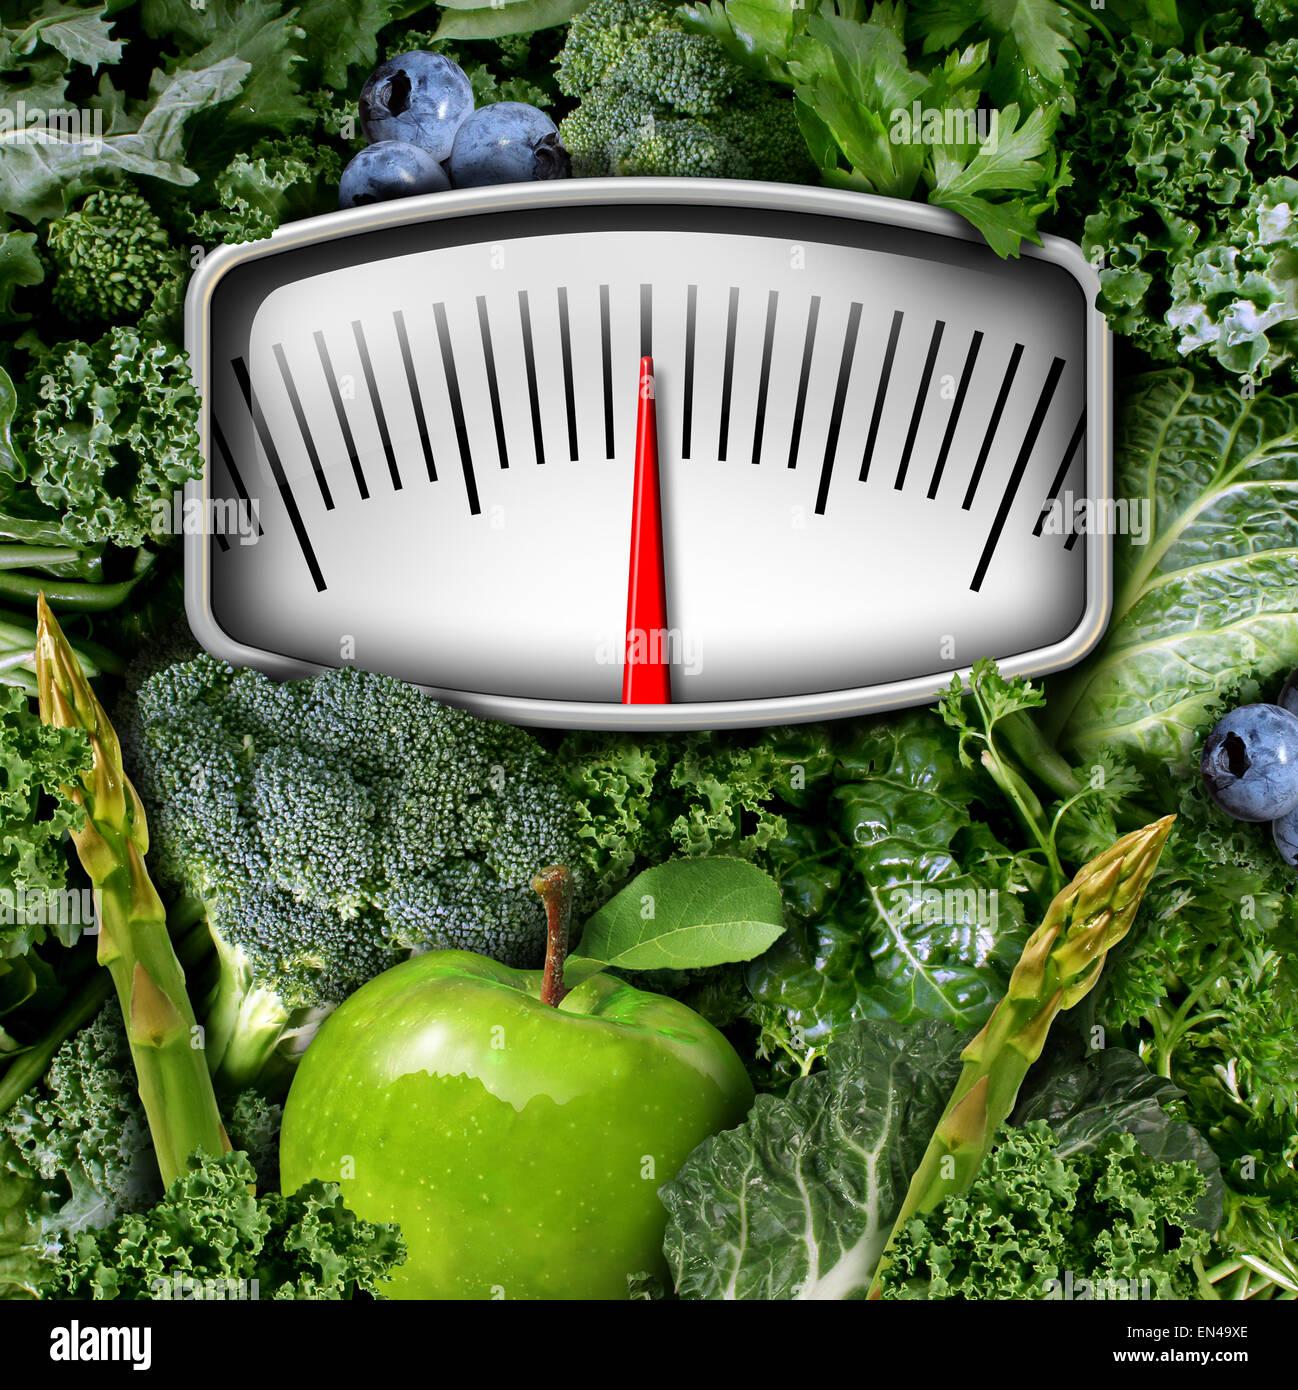 Frutas y verduras báscula concepto como un grupo natural de alimentos como el brócoli apple bayas azul Imagen De Stock